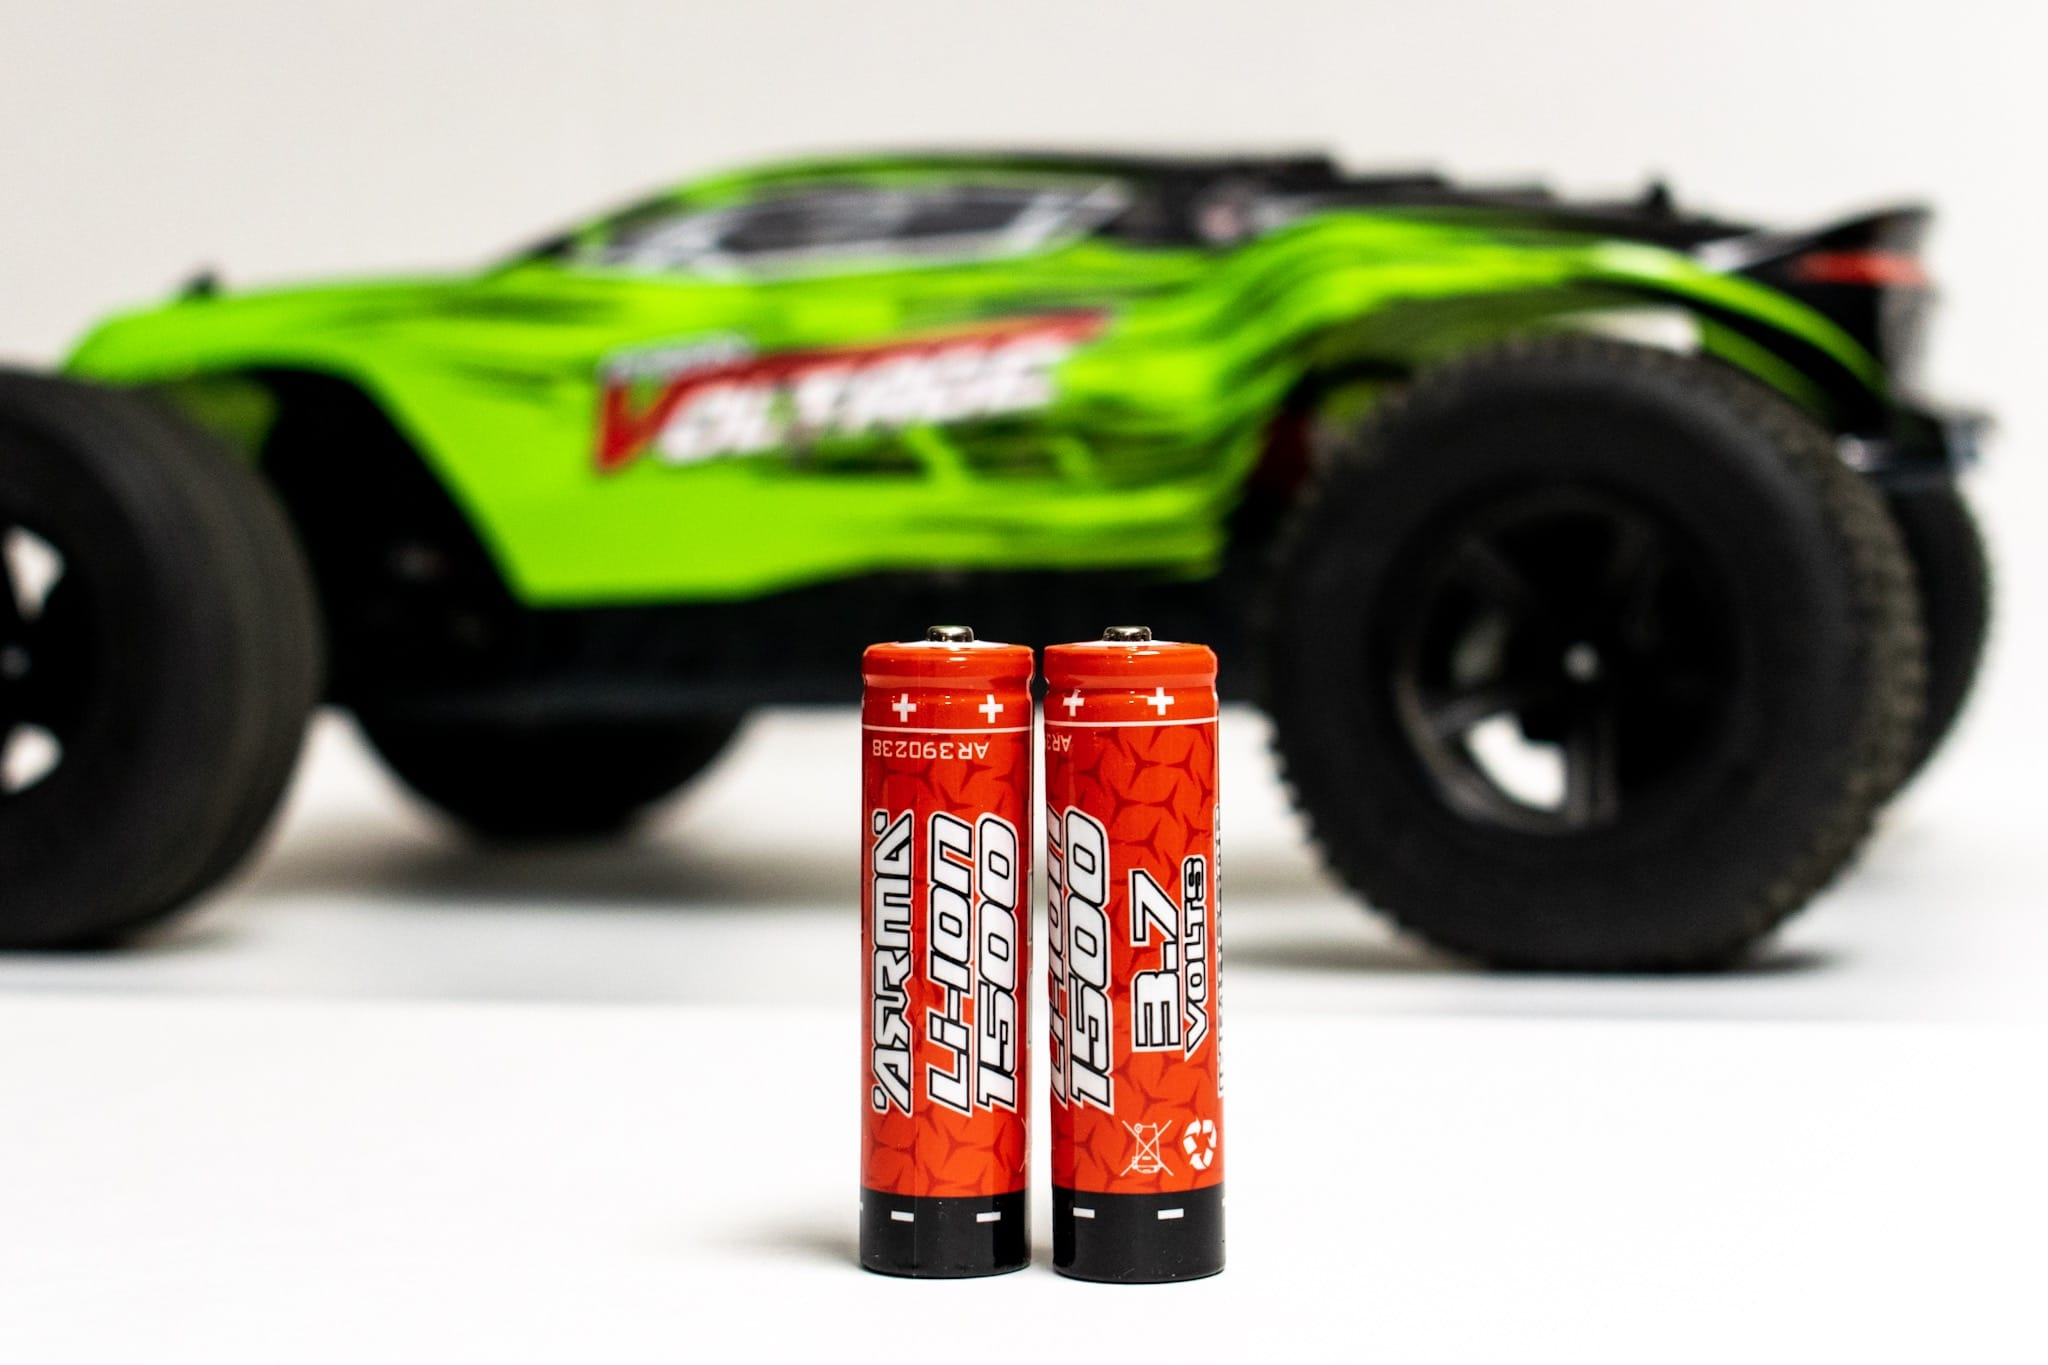 ARMA Fazon Voltage Studio - Batteries